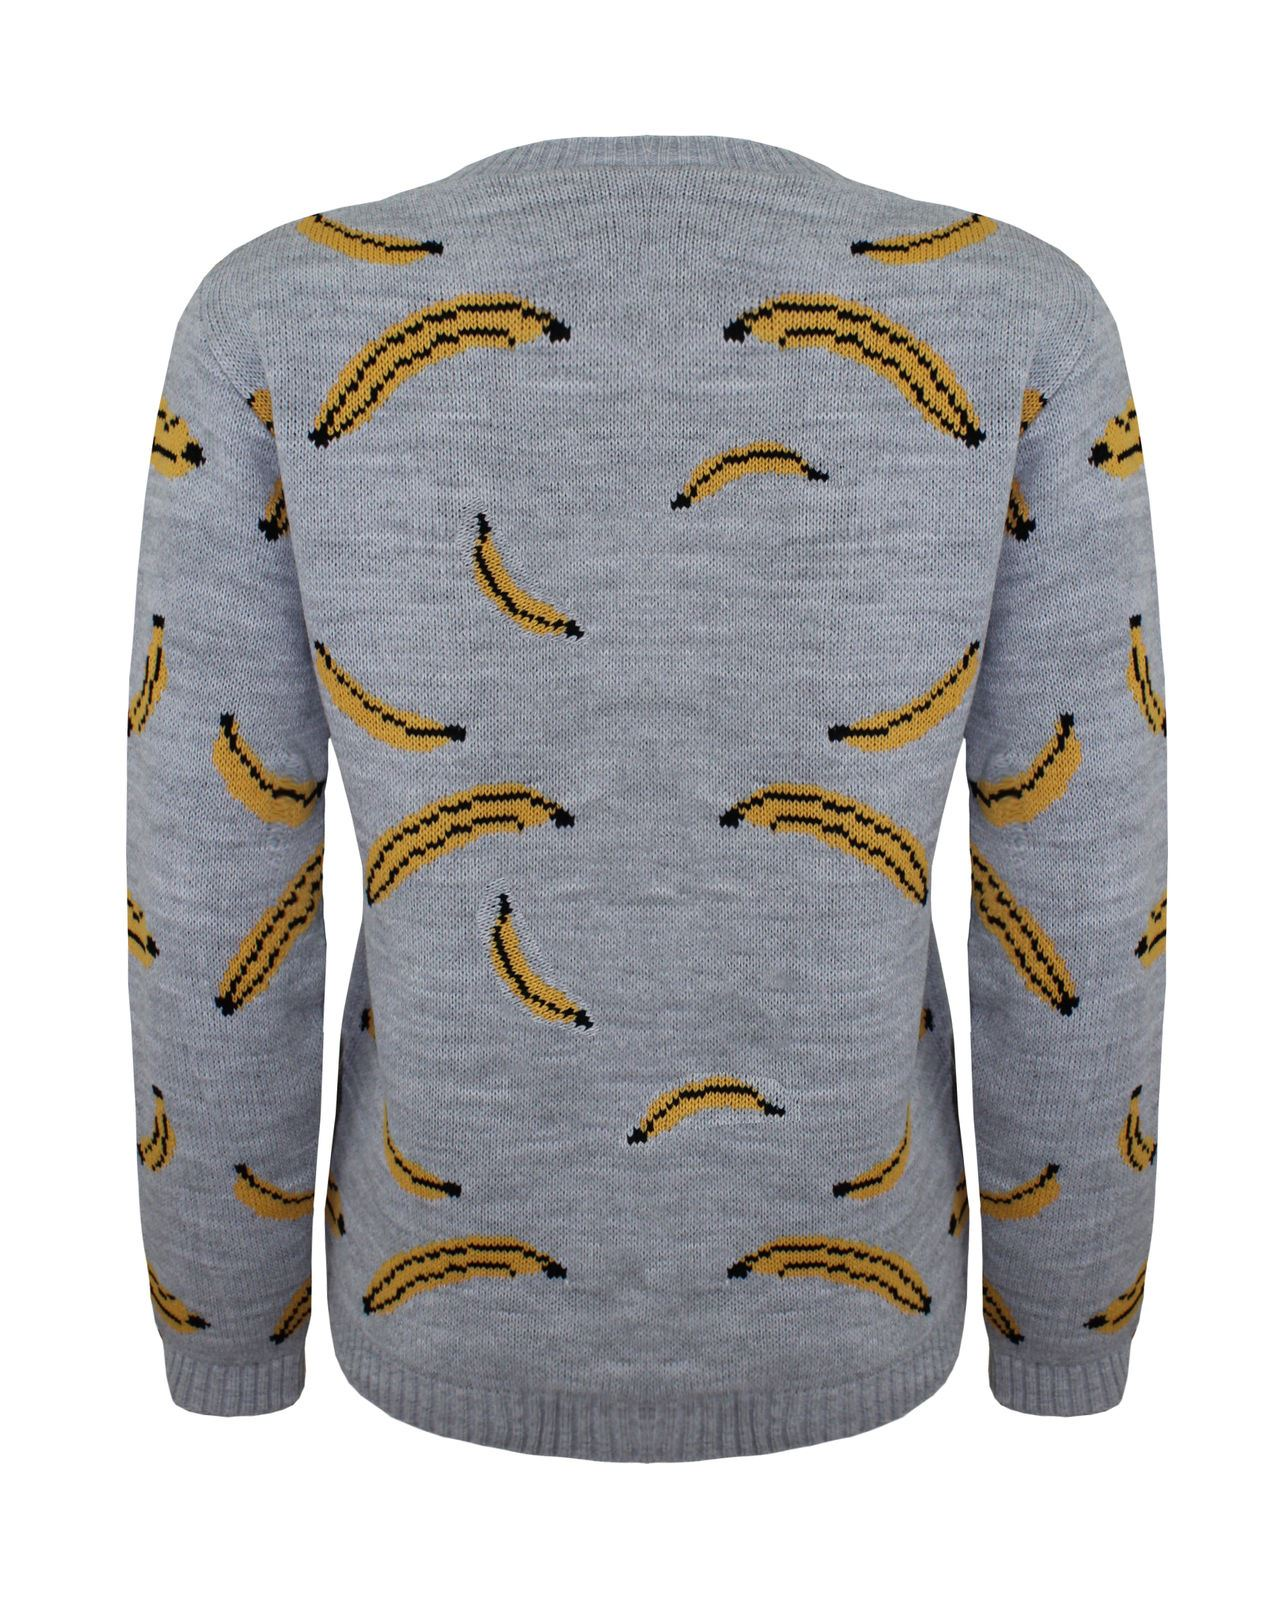 New kids knitted banana minion boom christmas xmas novelty jumper new kids knitted banana minion boom christmas xmas bankloansurffo Images